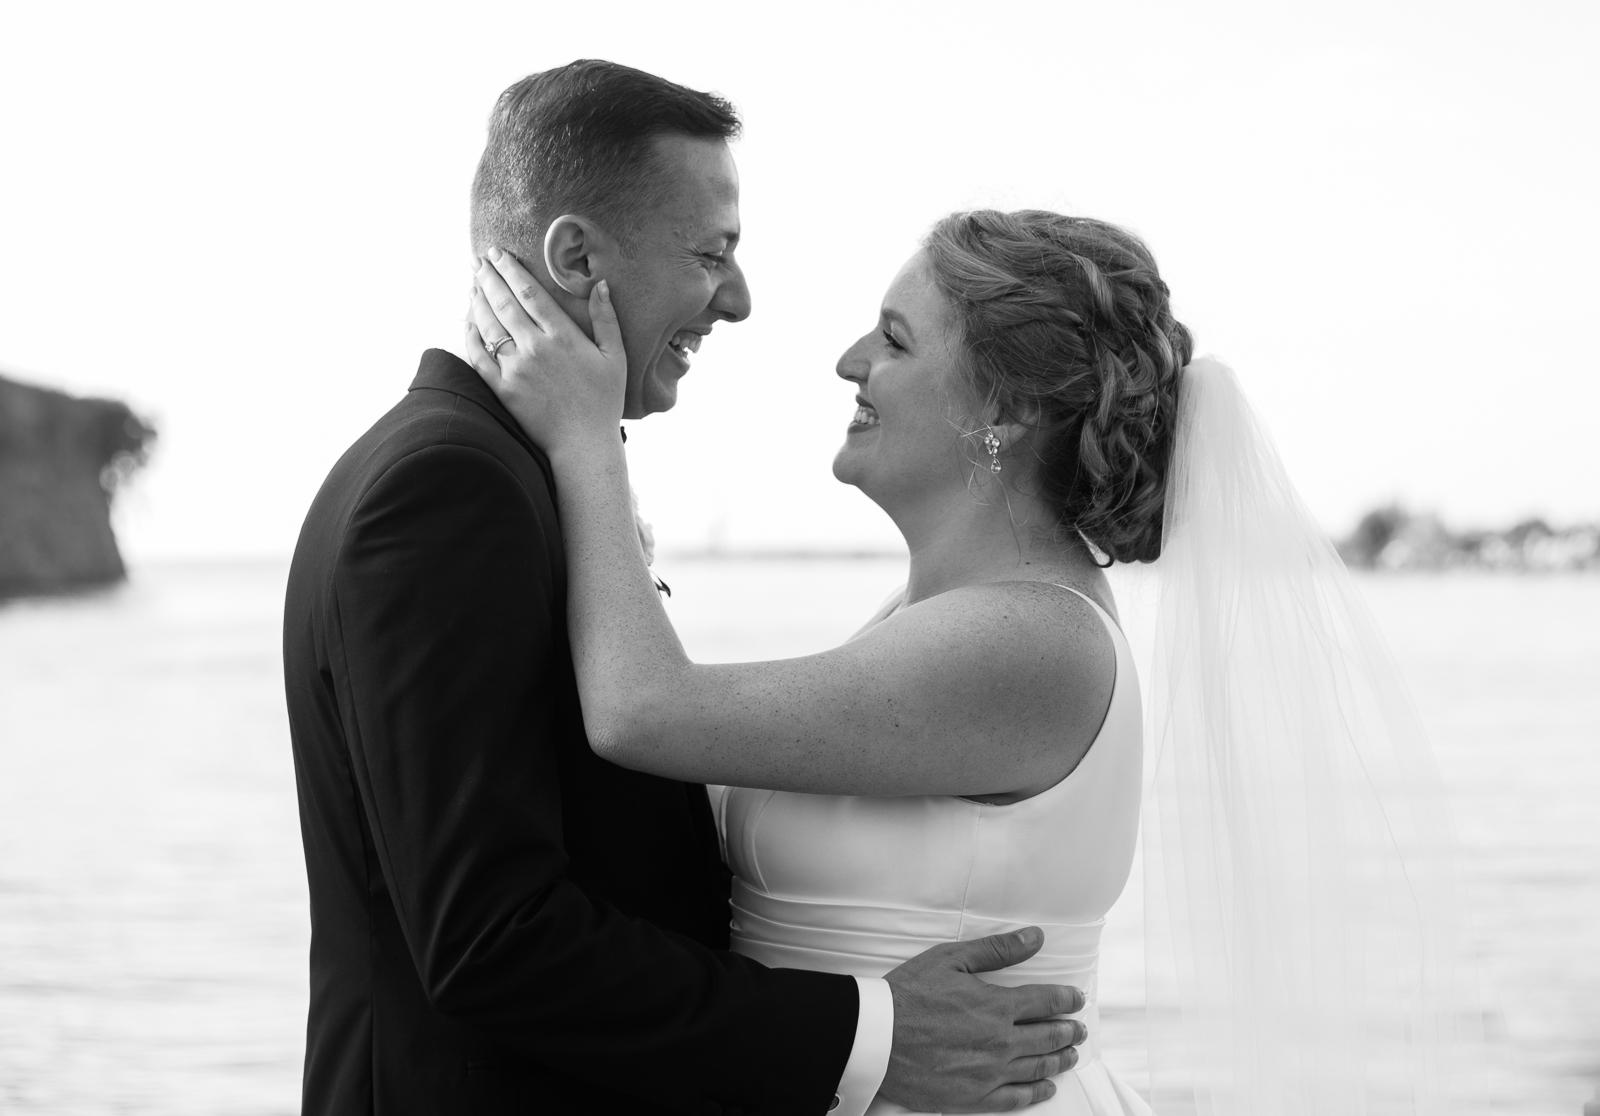 cleveland-yacht-club-wedding-photos-by-matt-erickson-photography-18.jpg